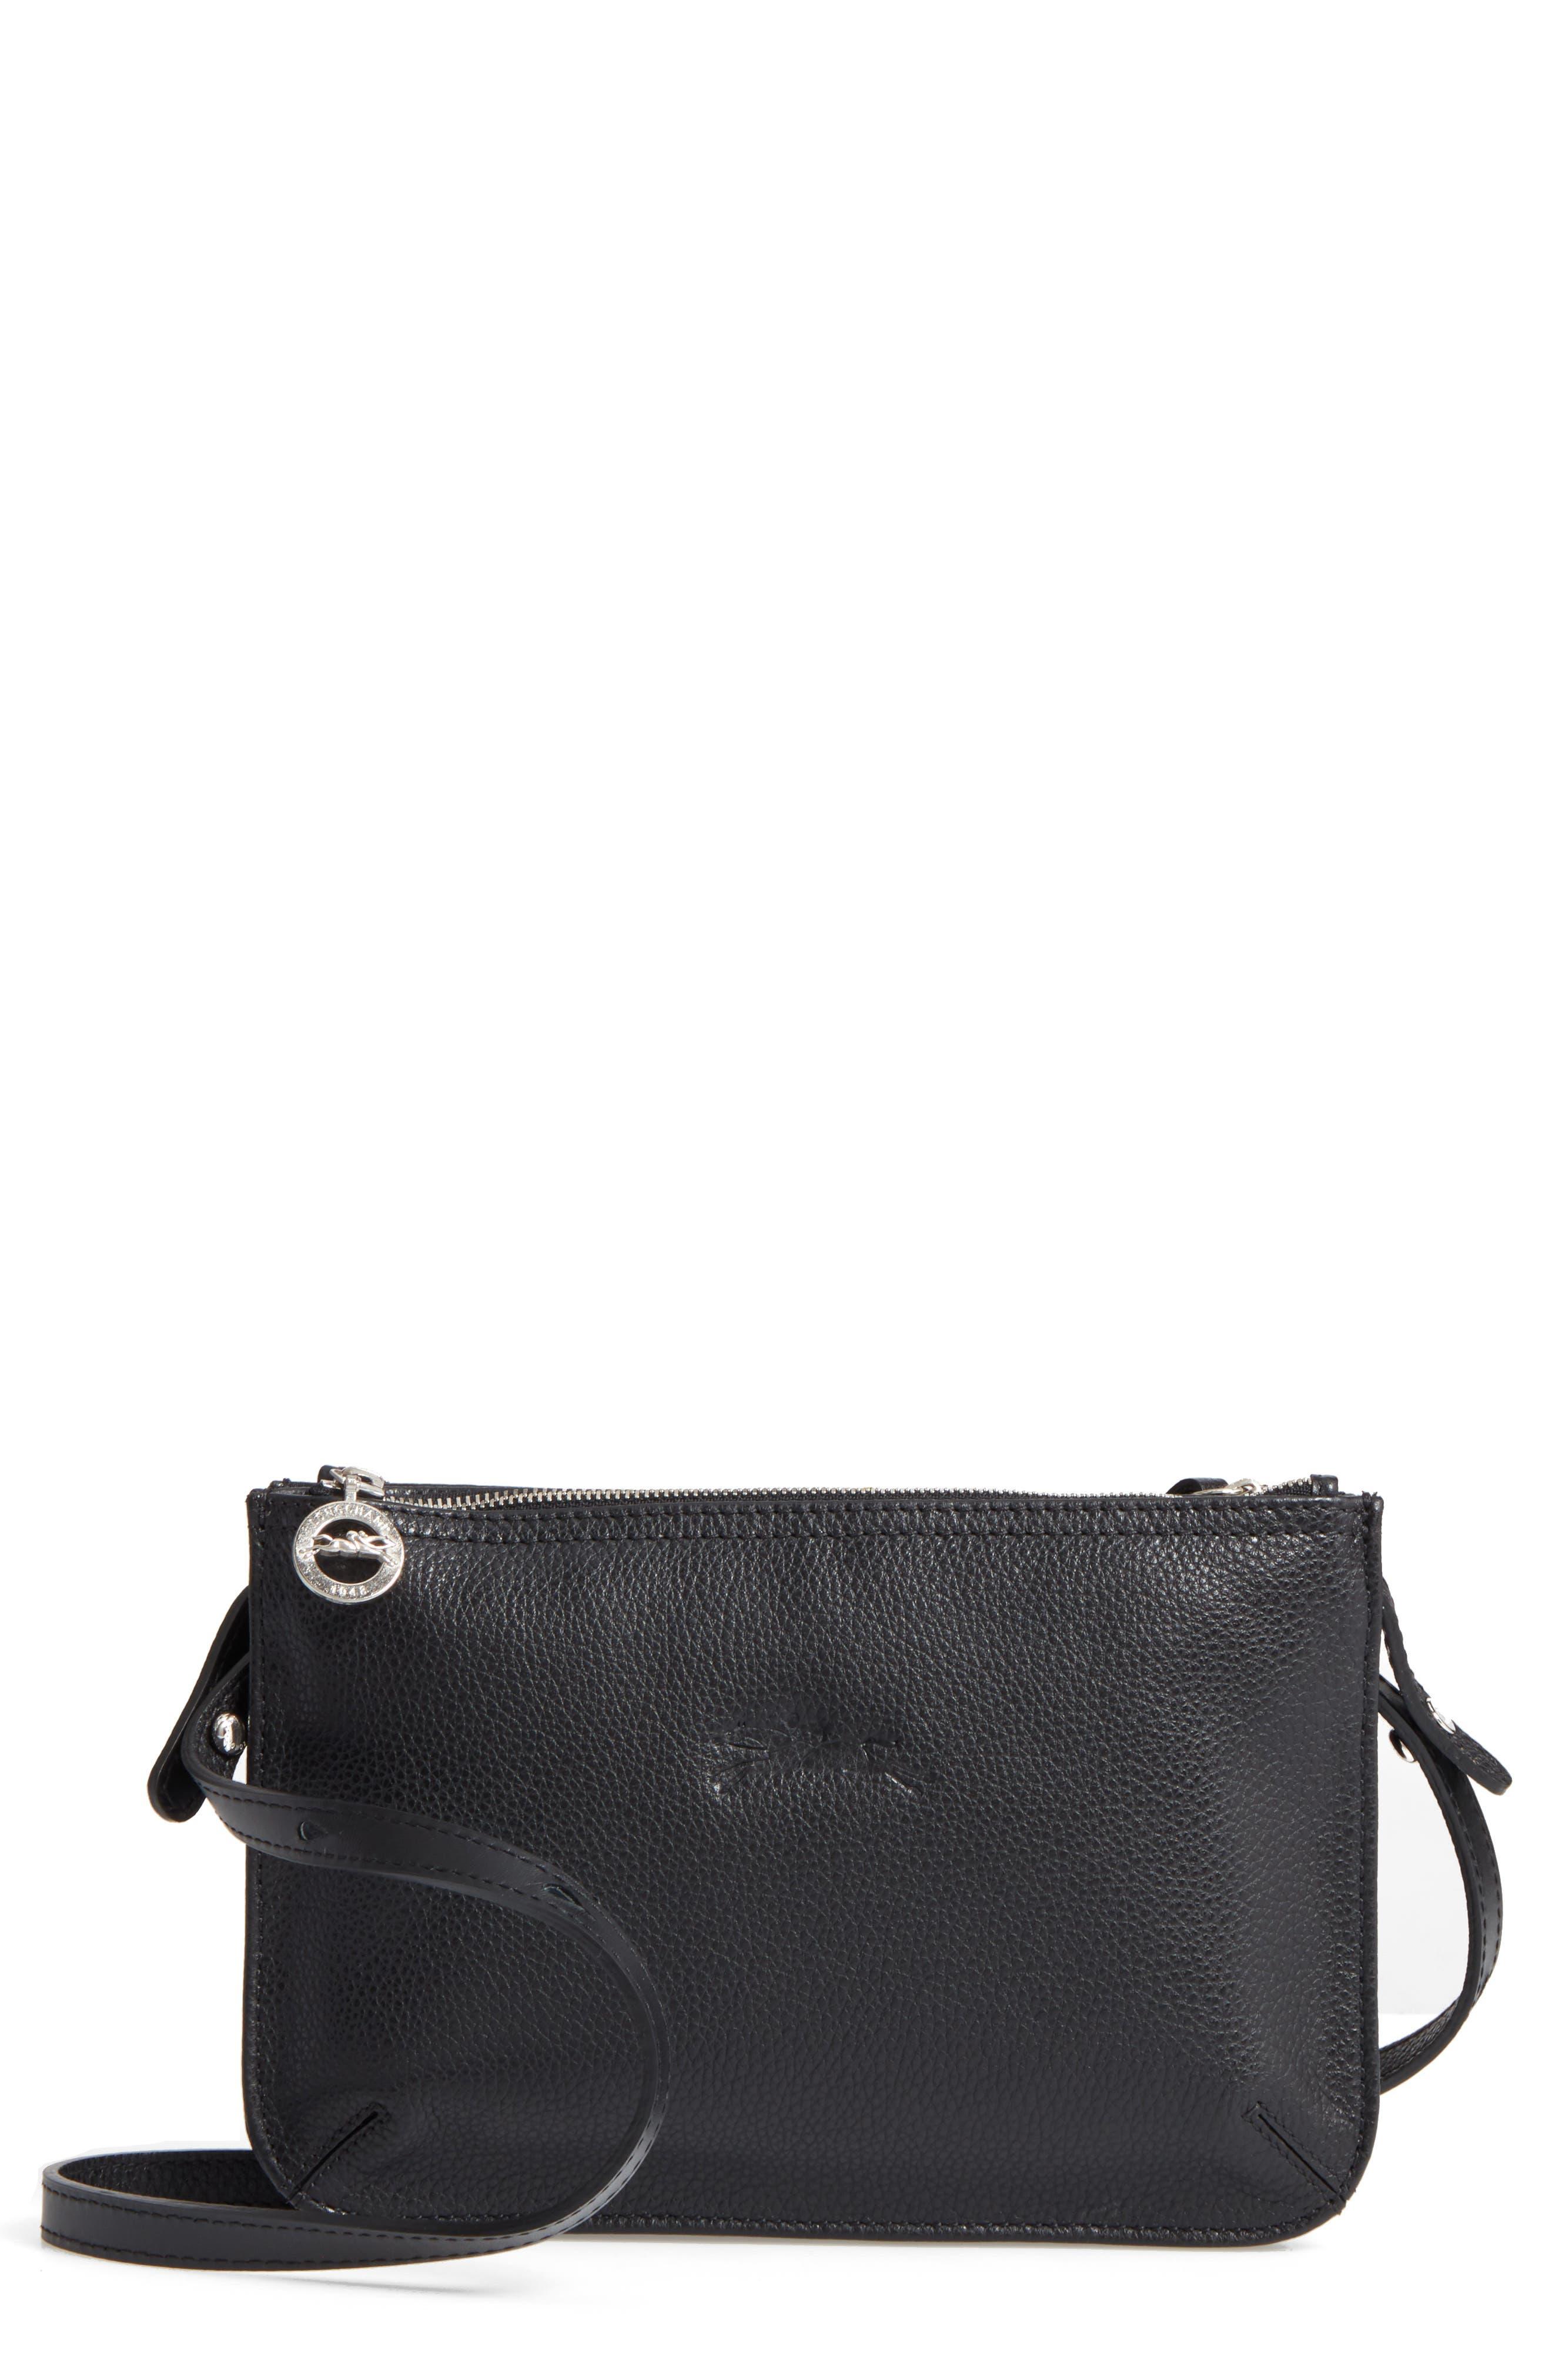 Le Foulonne Leather Crossbody Bag,                             Main thumbnail 1, color,                             002